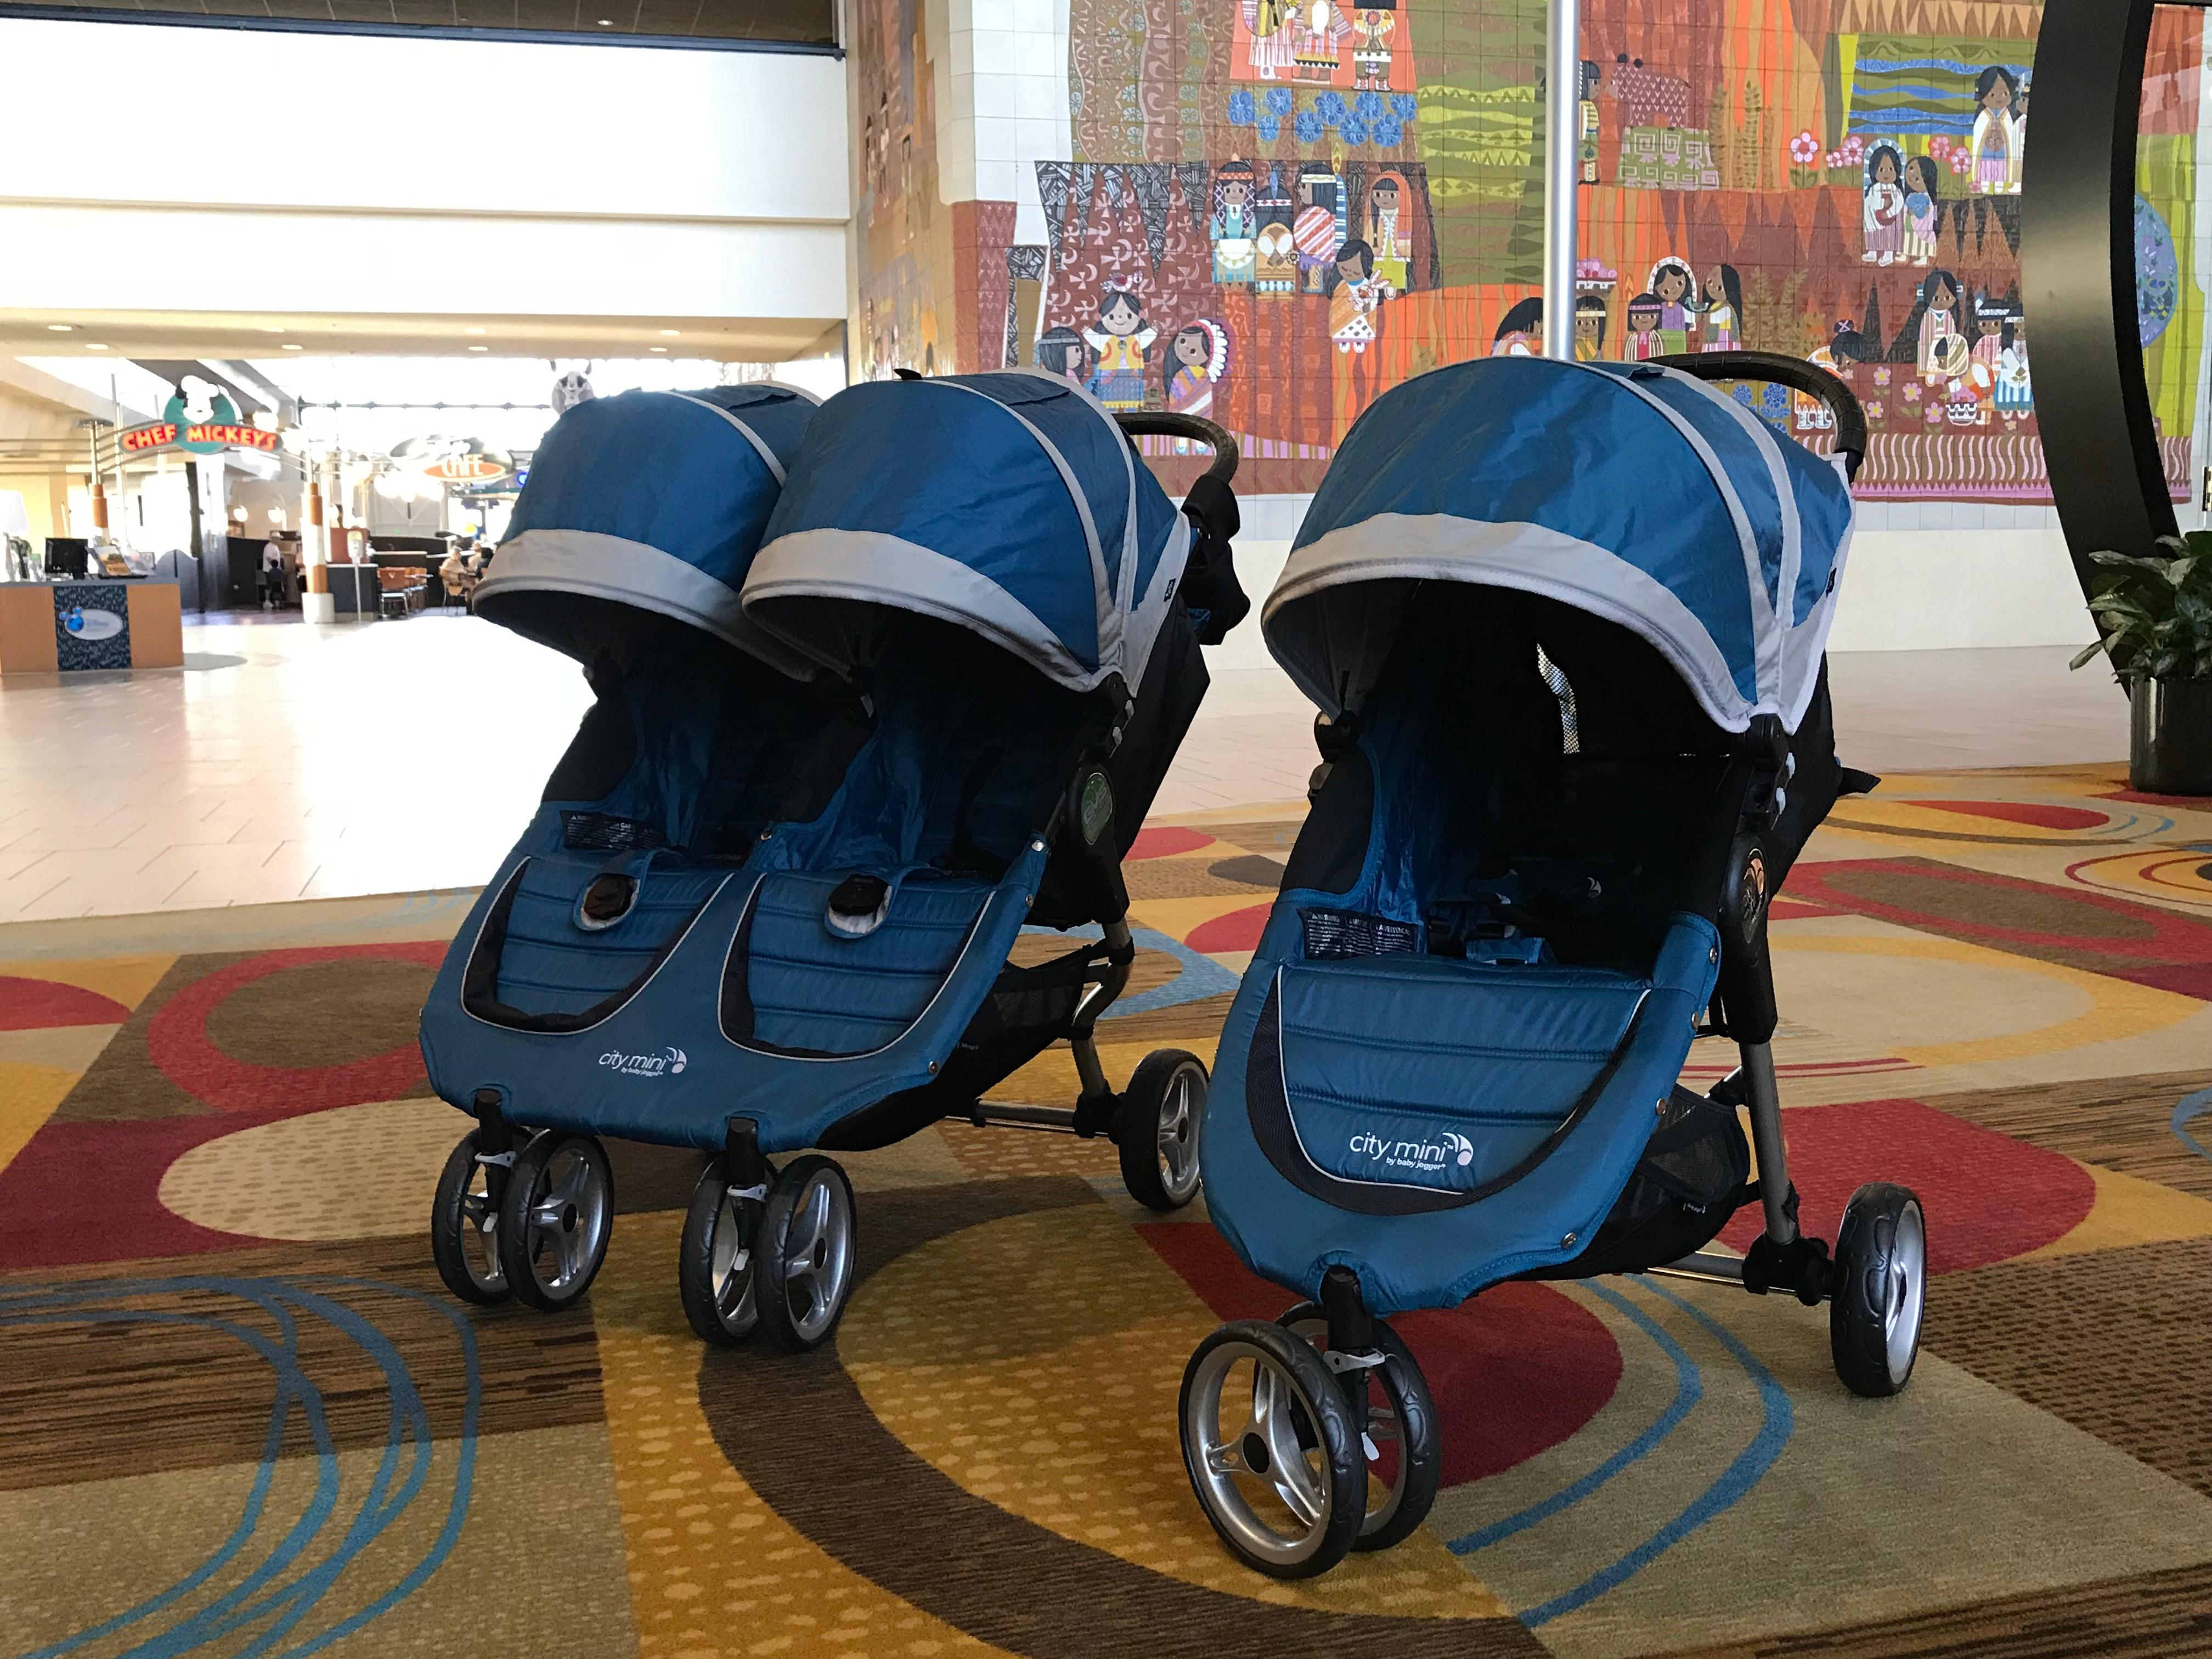 Stroller Rentals Disney image 85